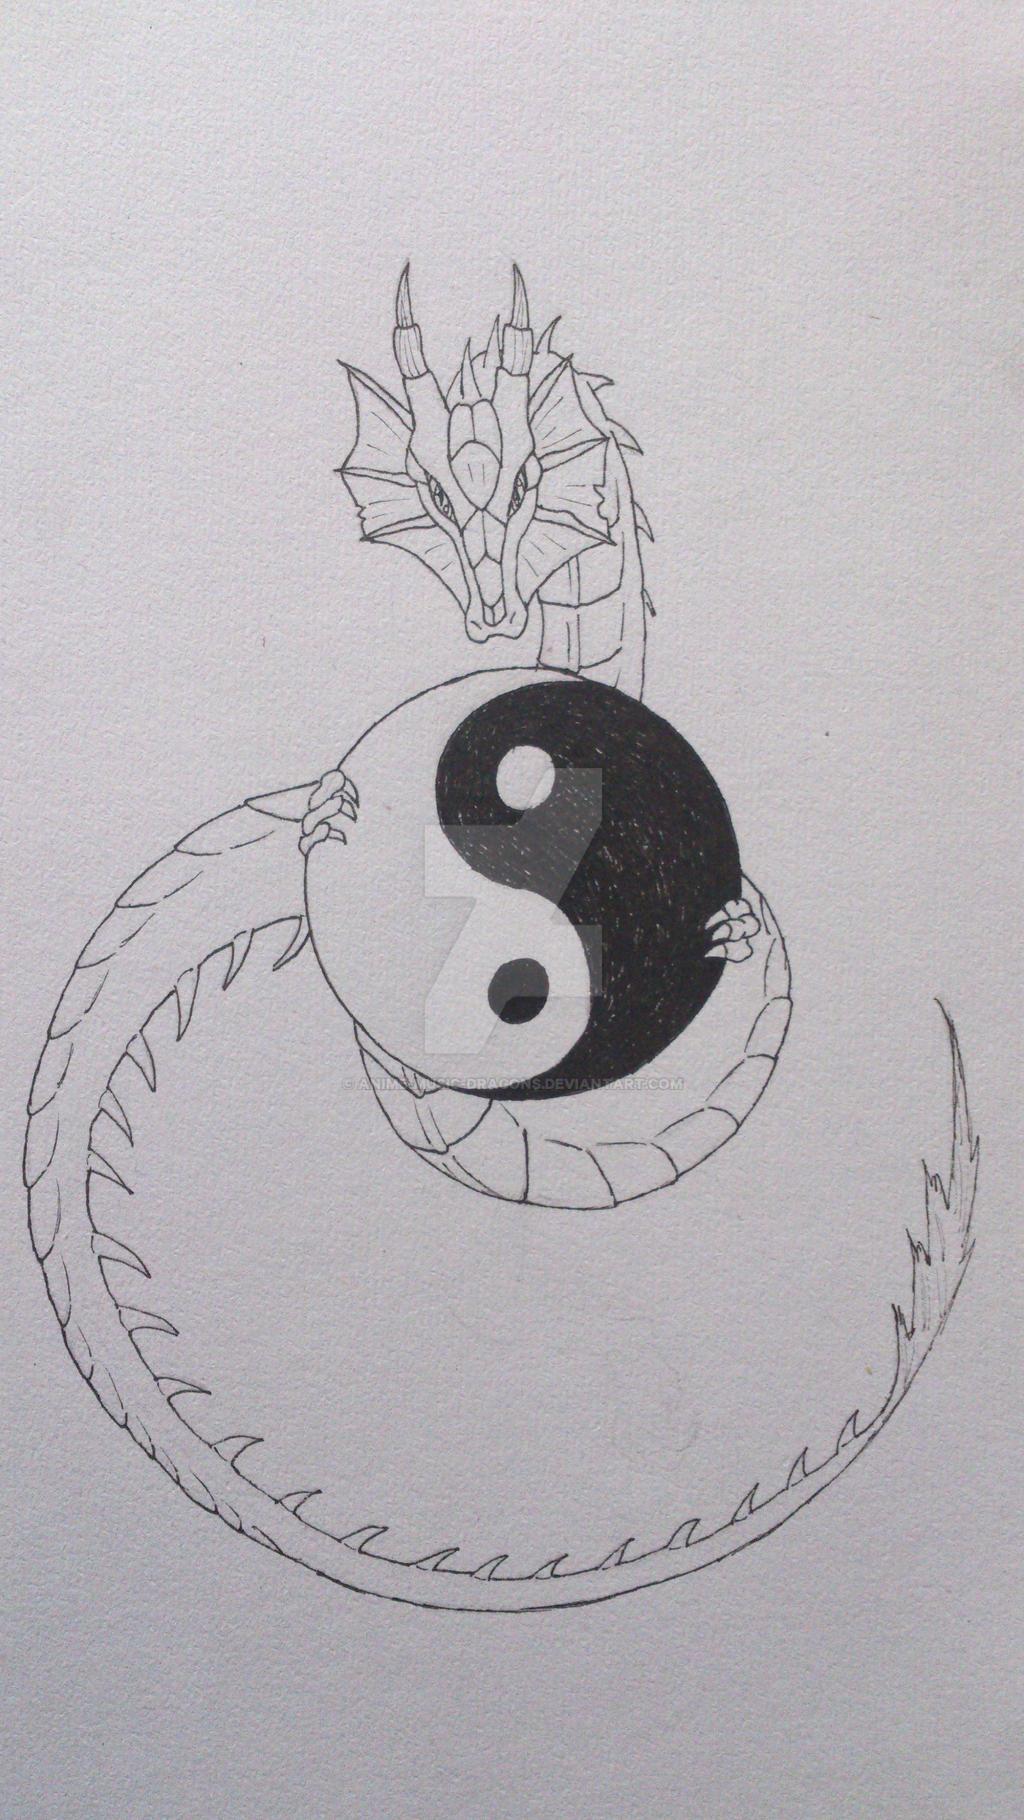 Yin+Yang Dragon by Anime-Music-Dragons on DeviantArt